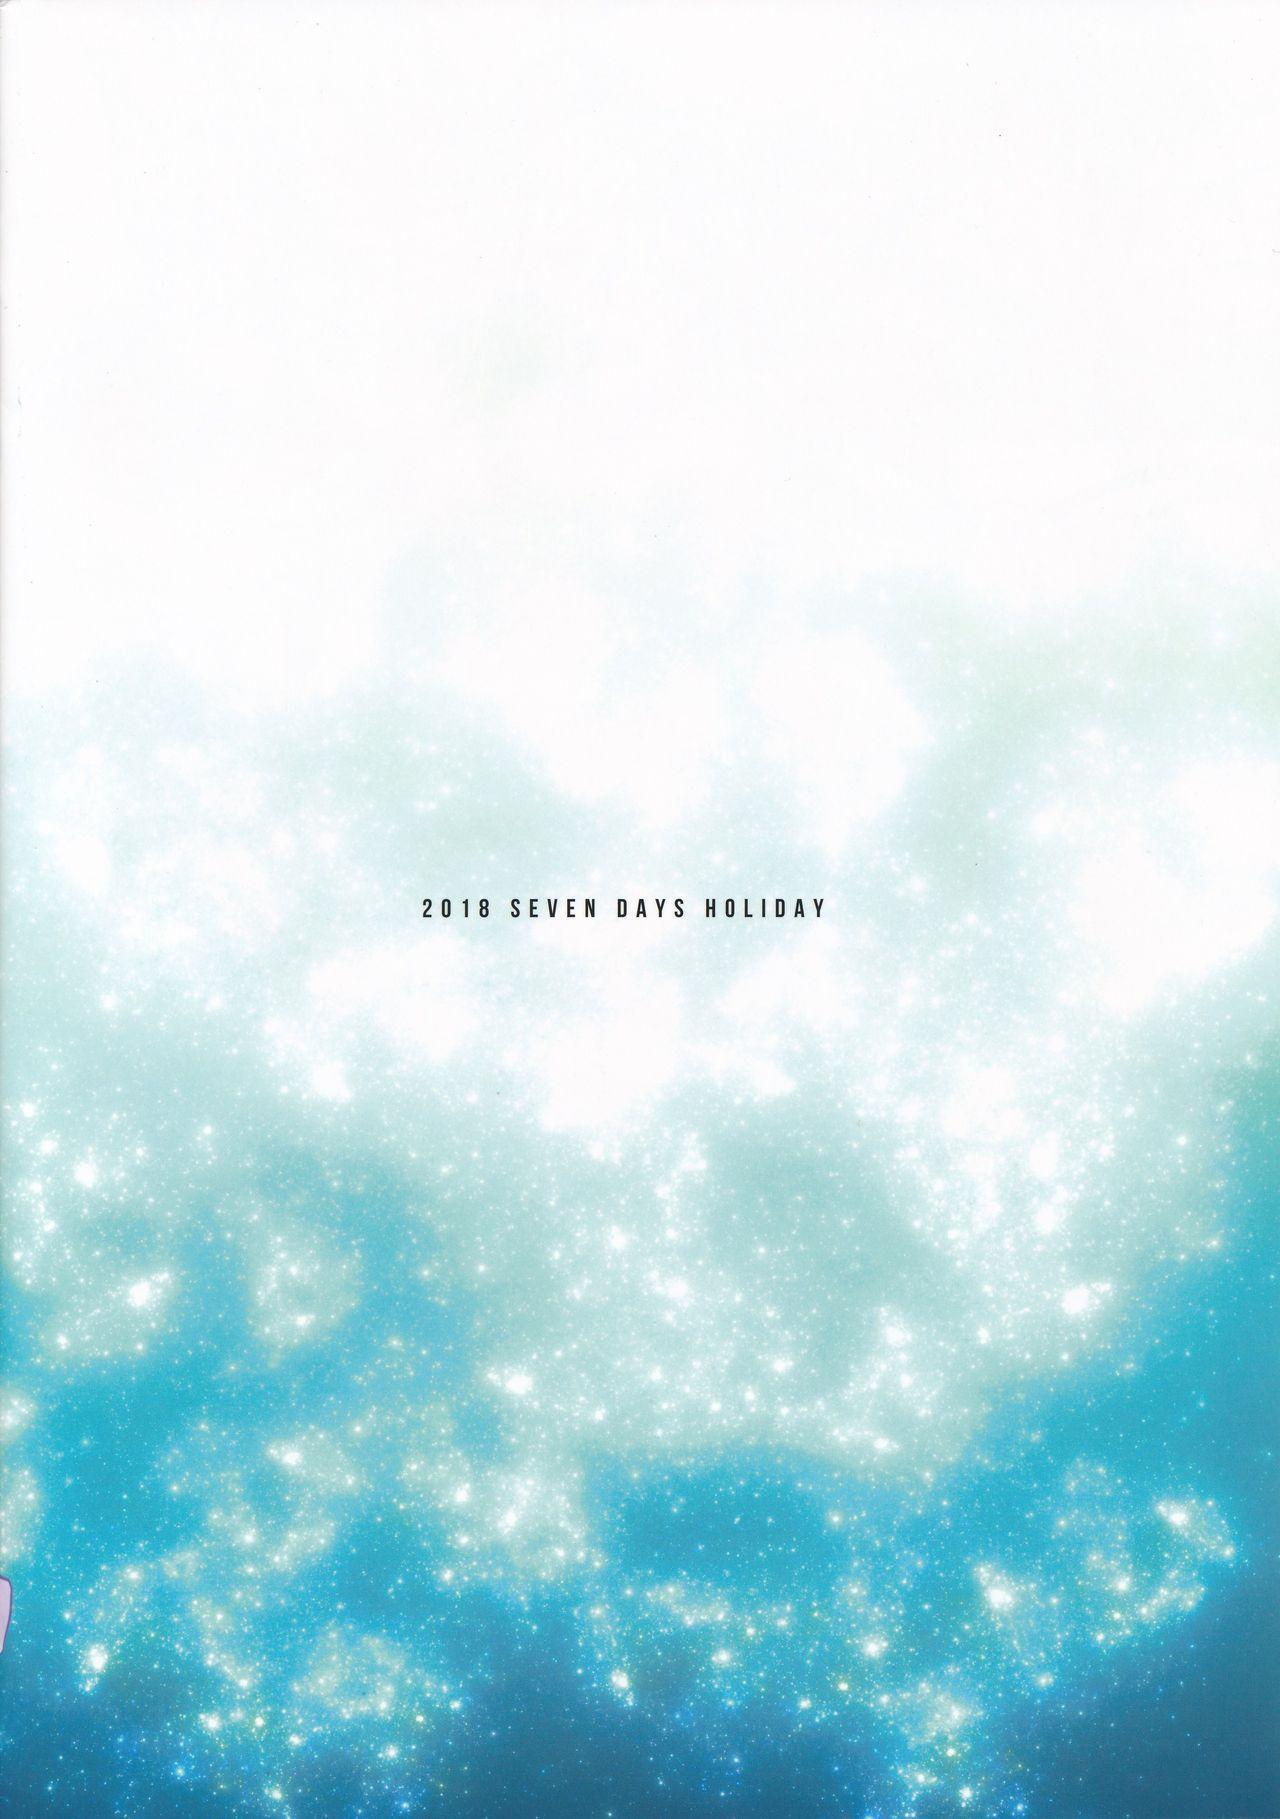 Aogami Shoujo no Junan - The Passion of Blue Hair Girls 1